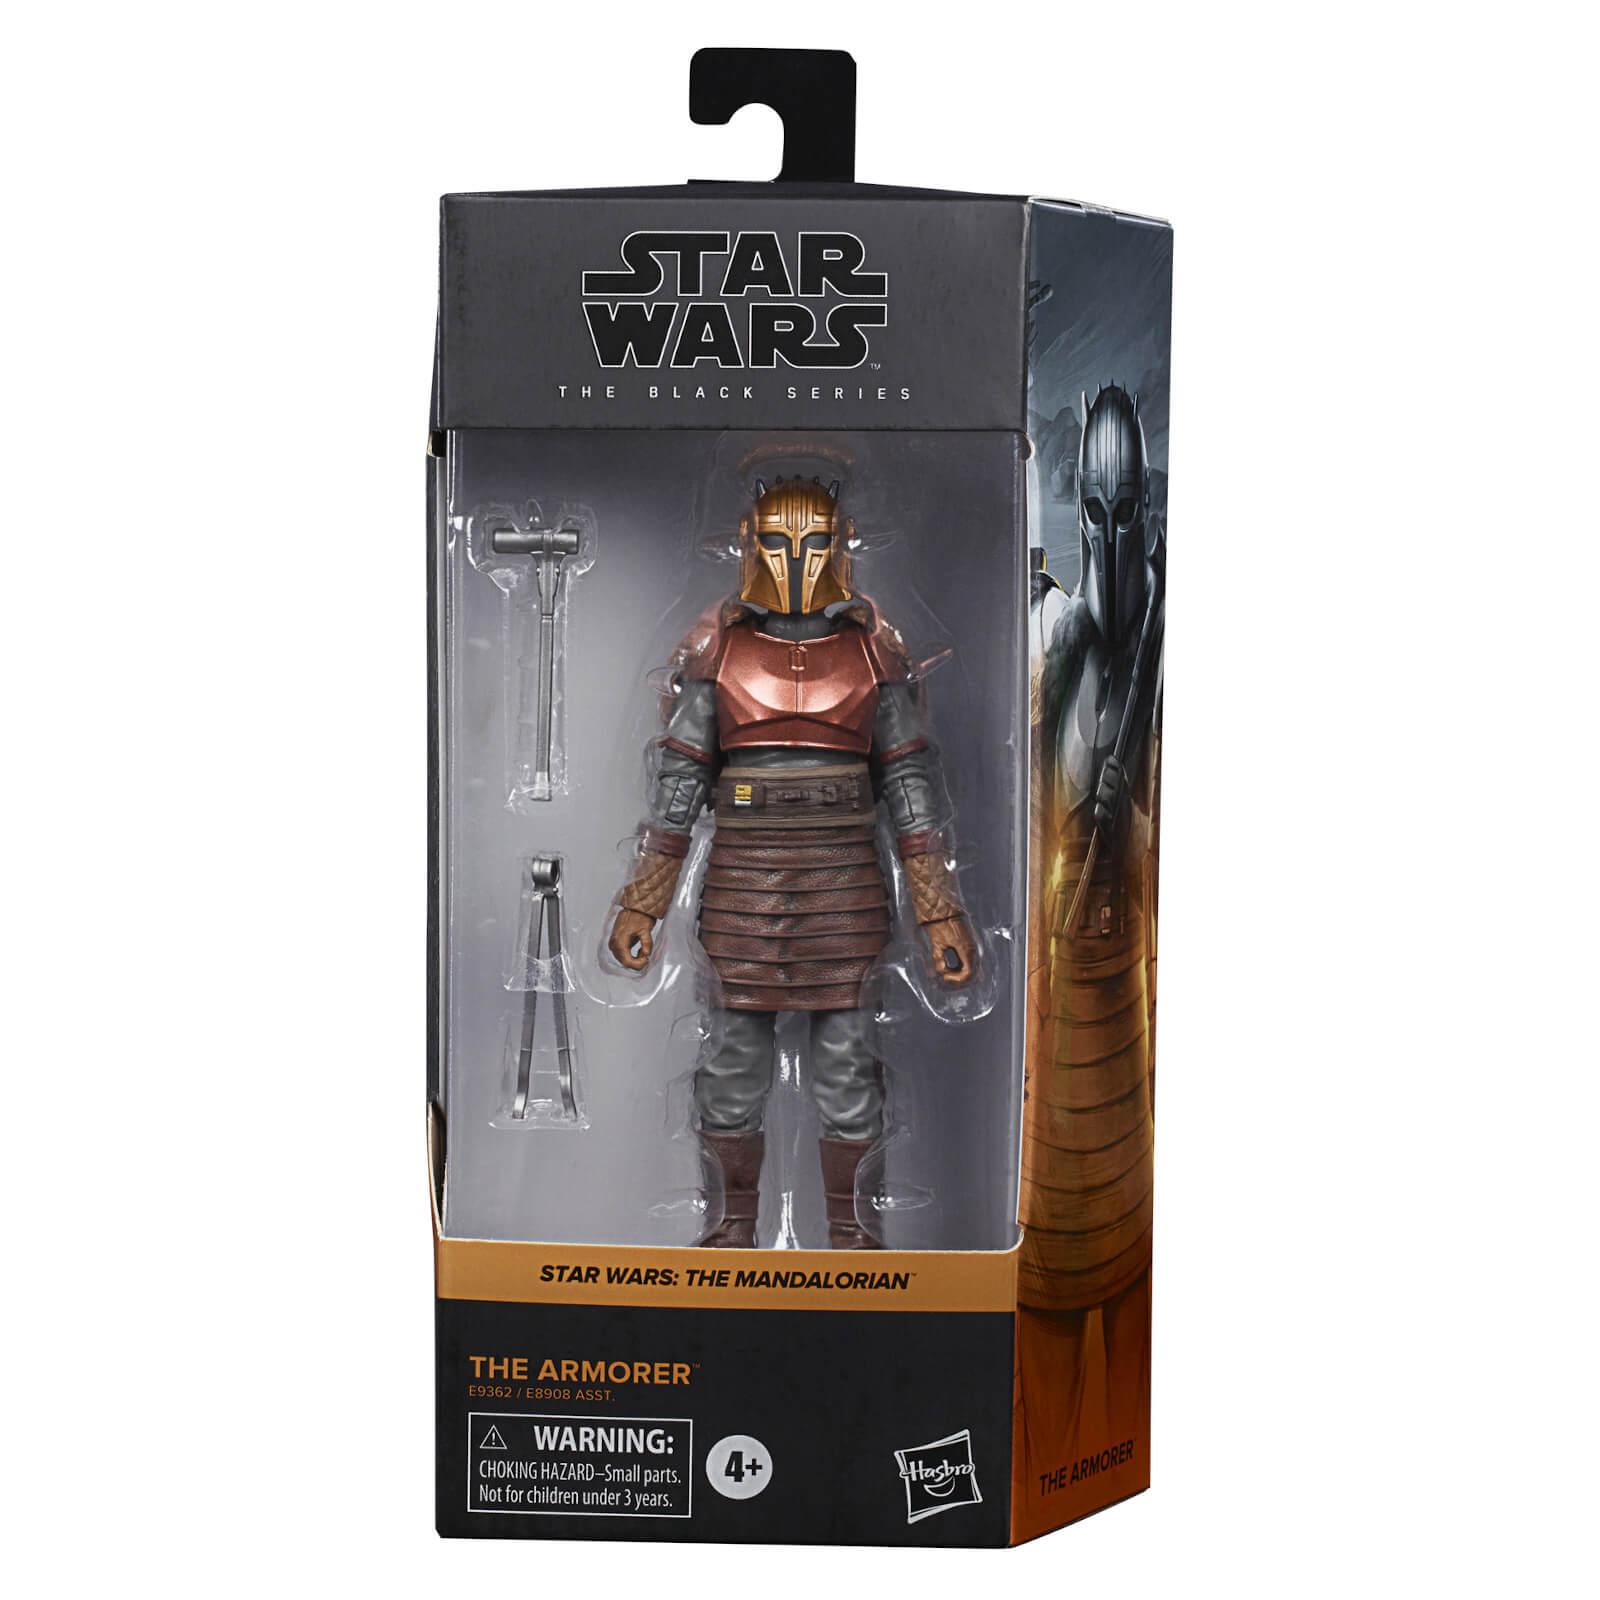 Image of Hasbro Star Wars The Mandalorian Black Series Armorer Action Figure